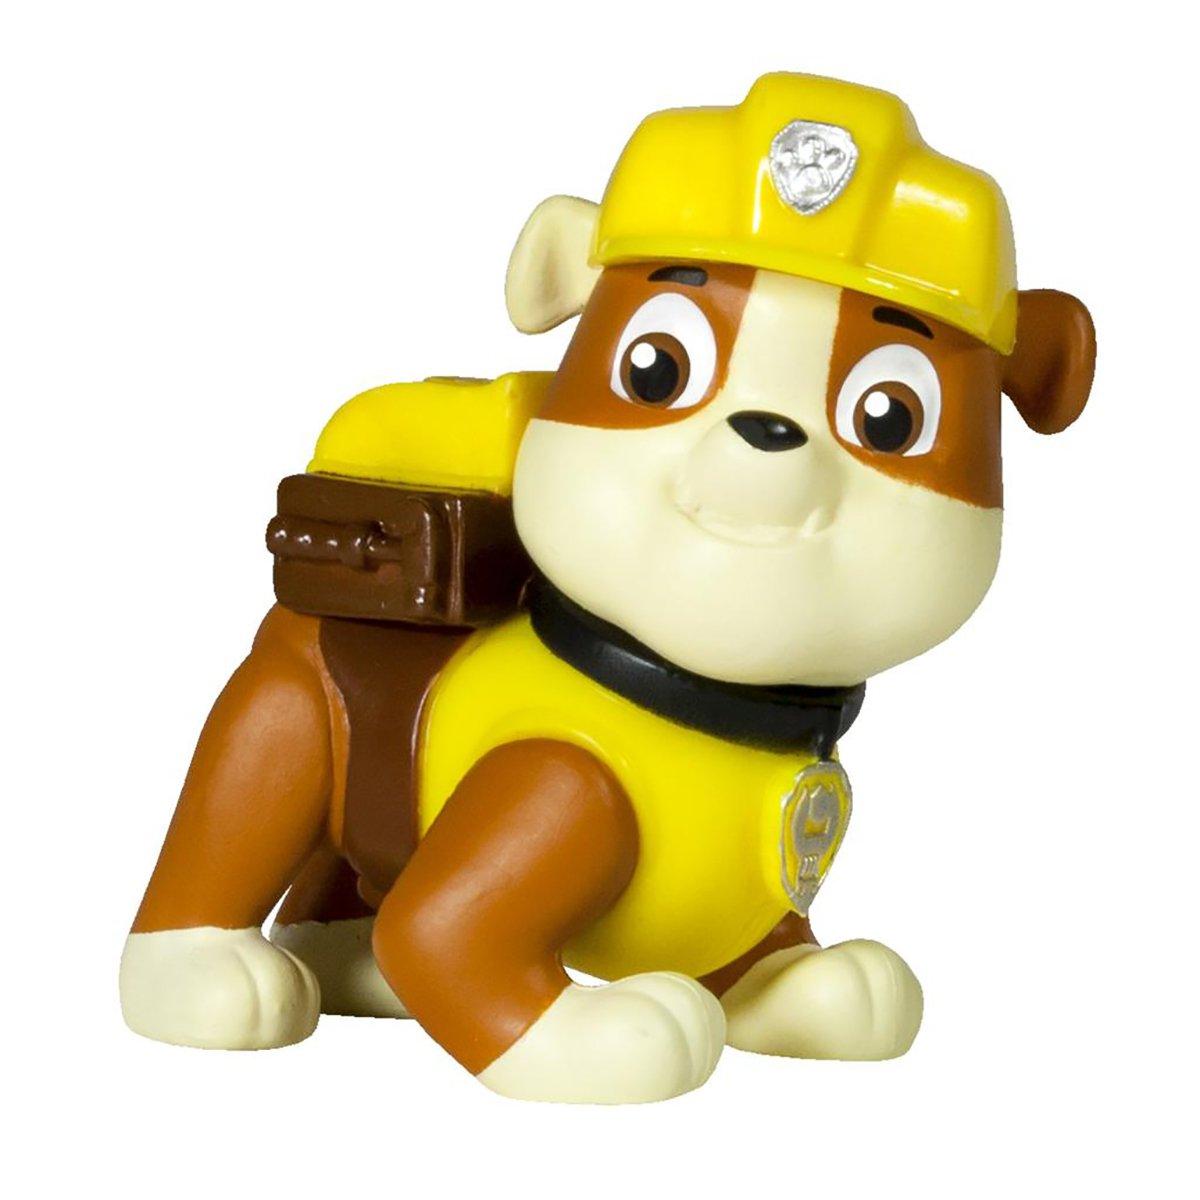 figurina paw patrol - rubble constructor, 6.6 cm